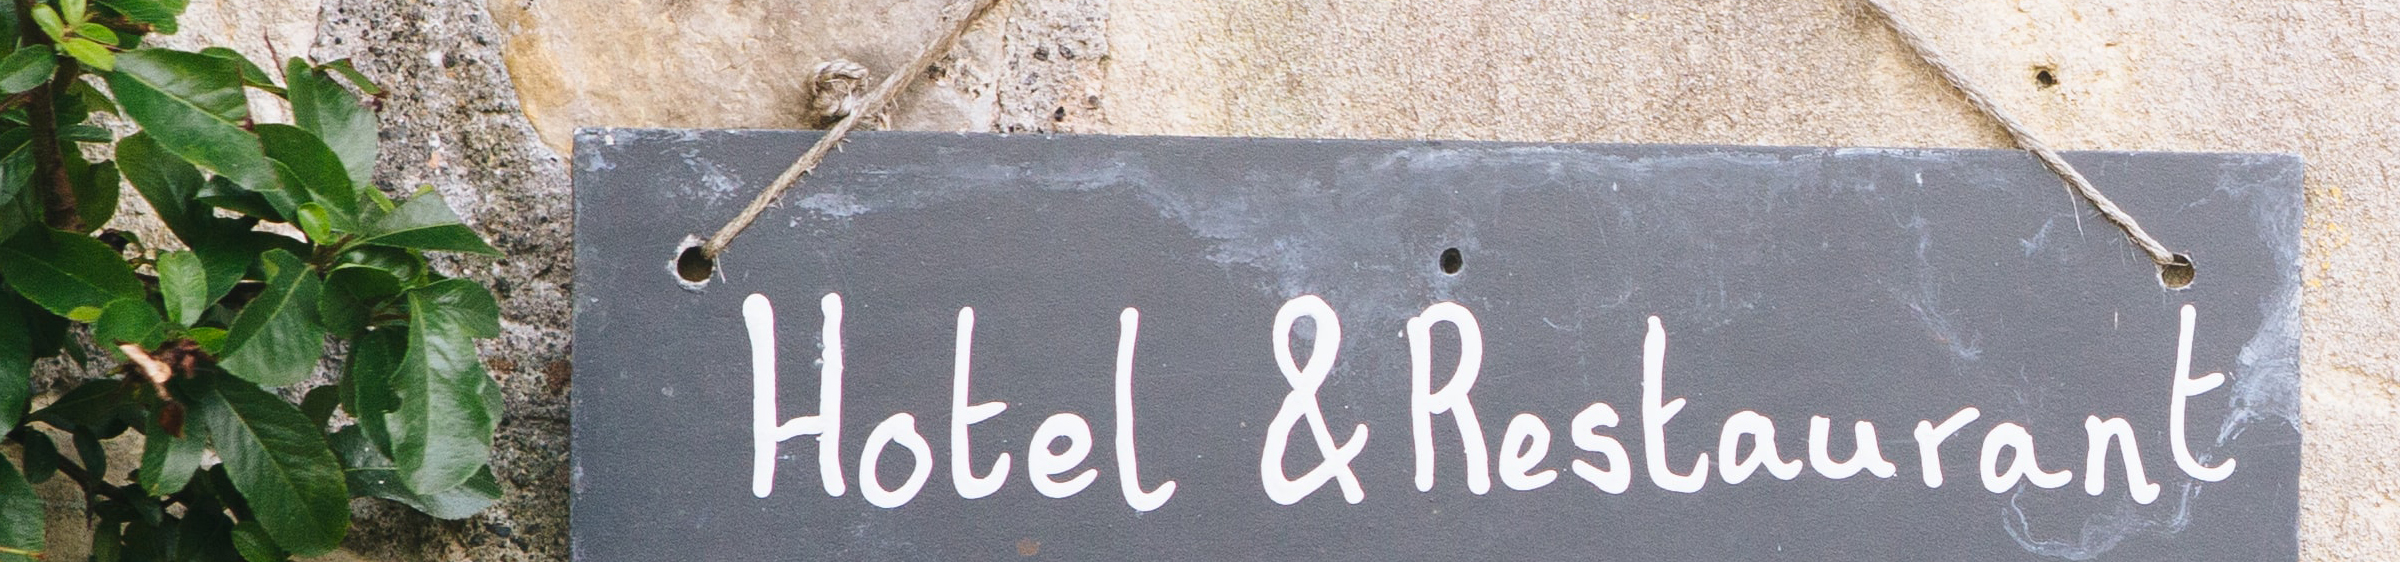 Hotel & Restaurant sign